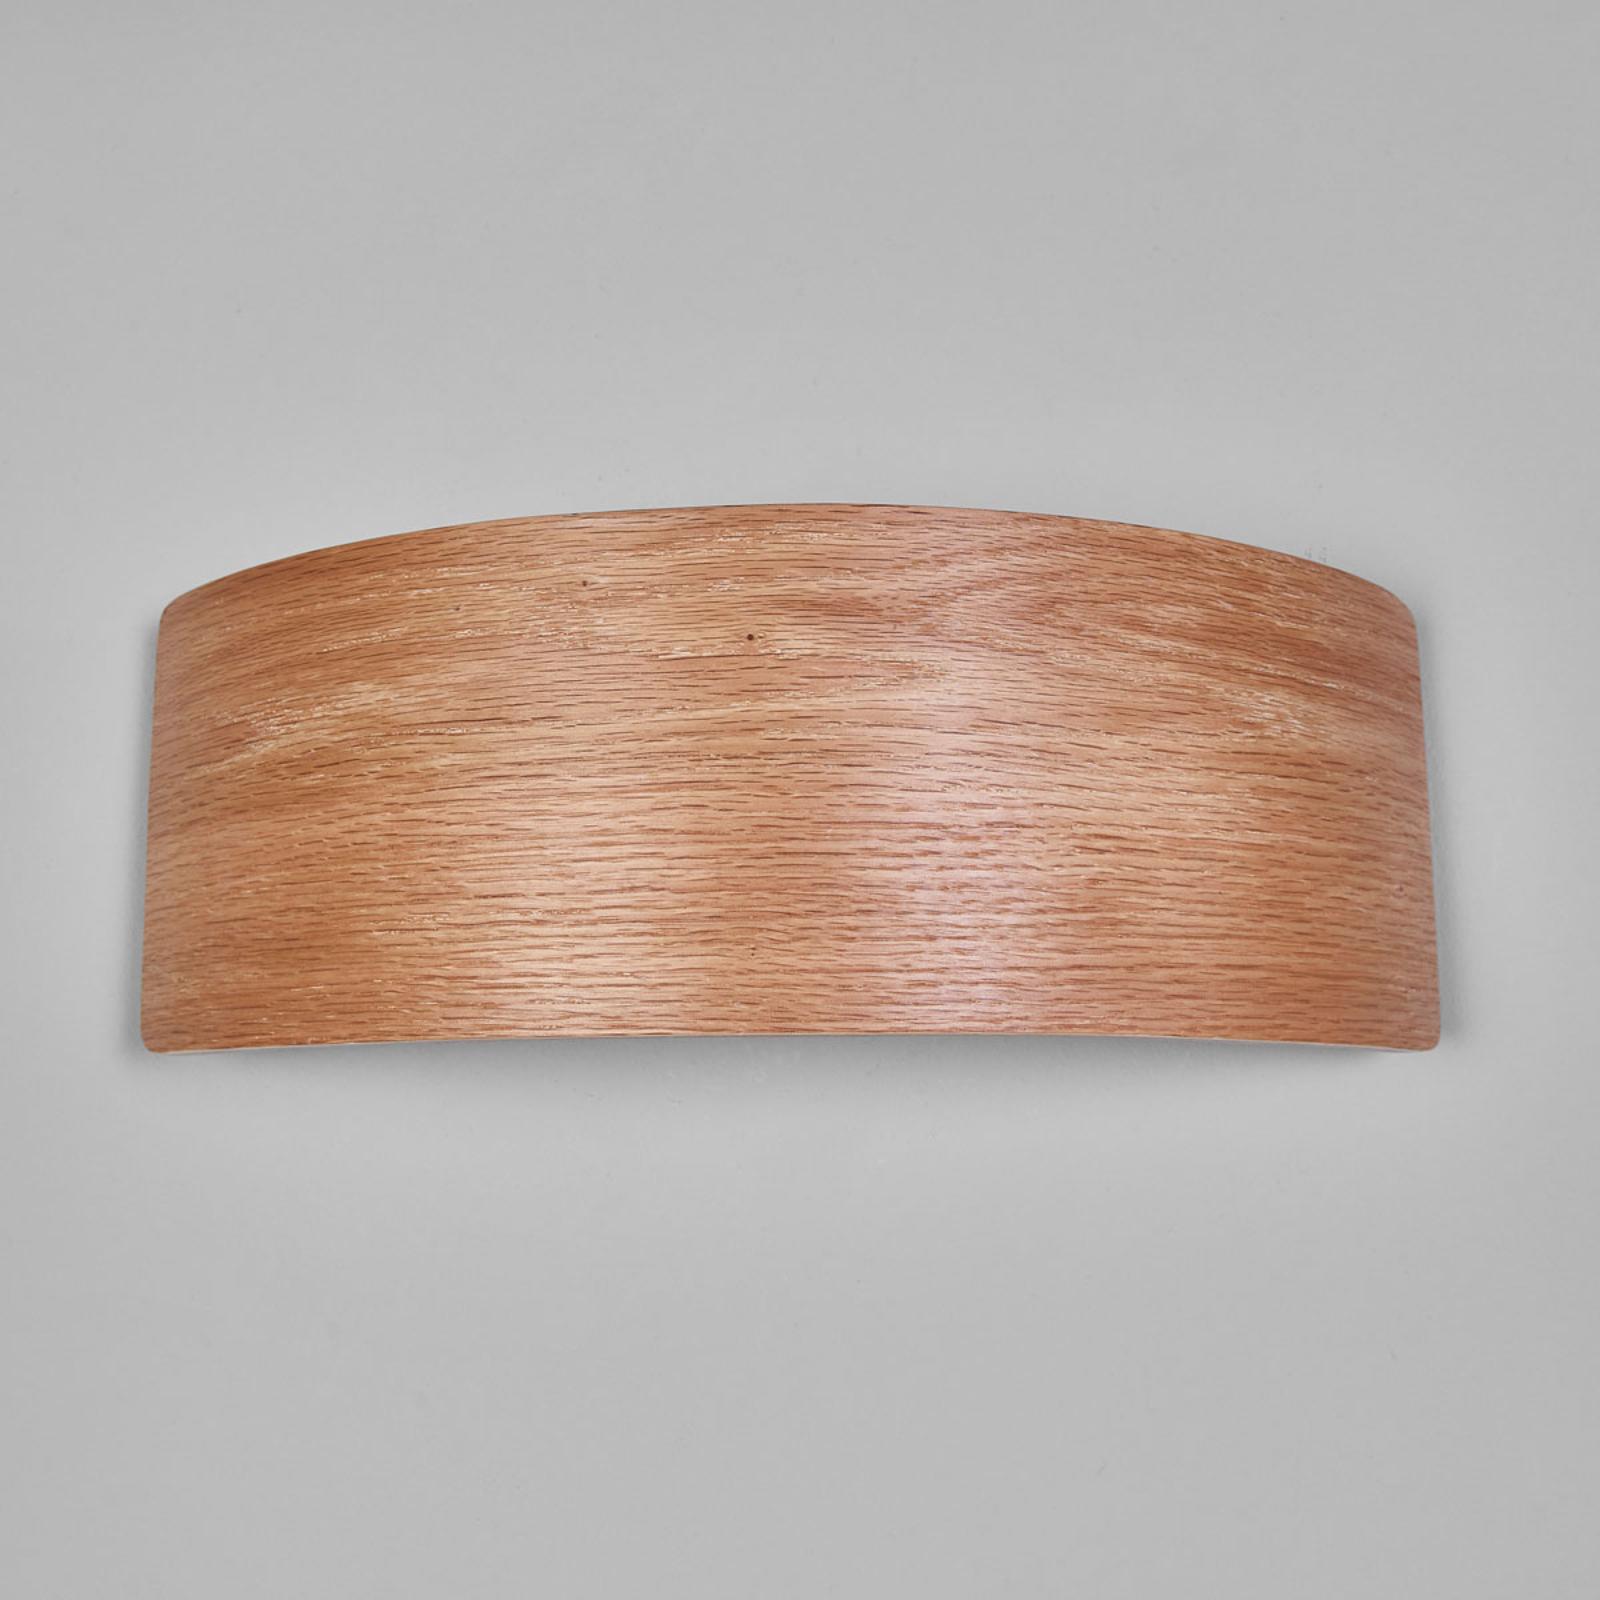 Atractivo aplique de madera Rafailia con LEDs